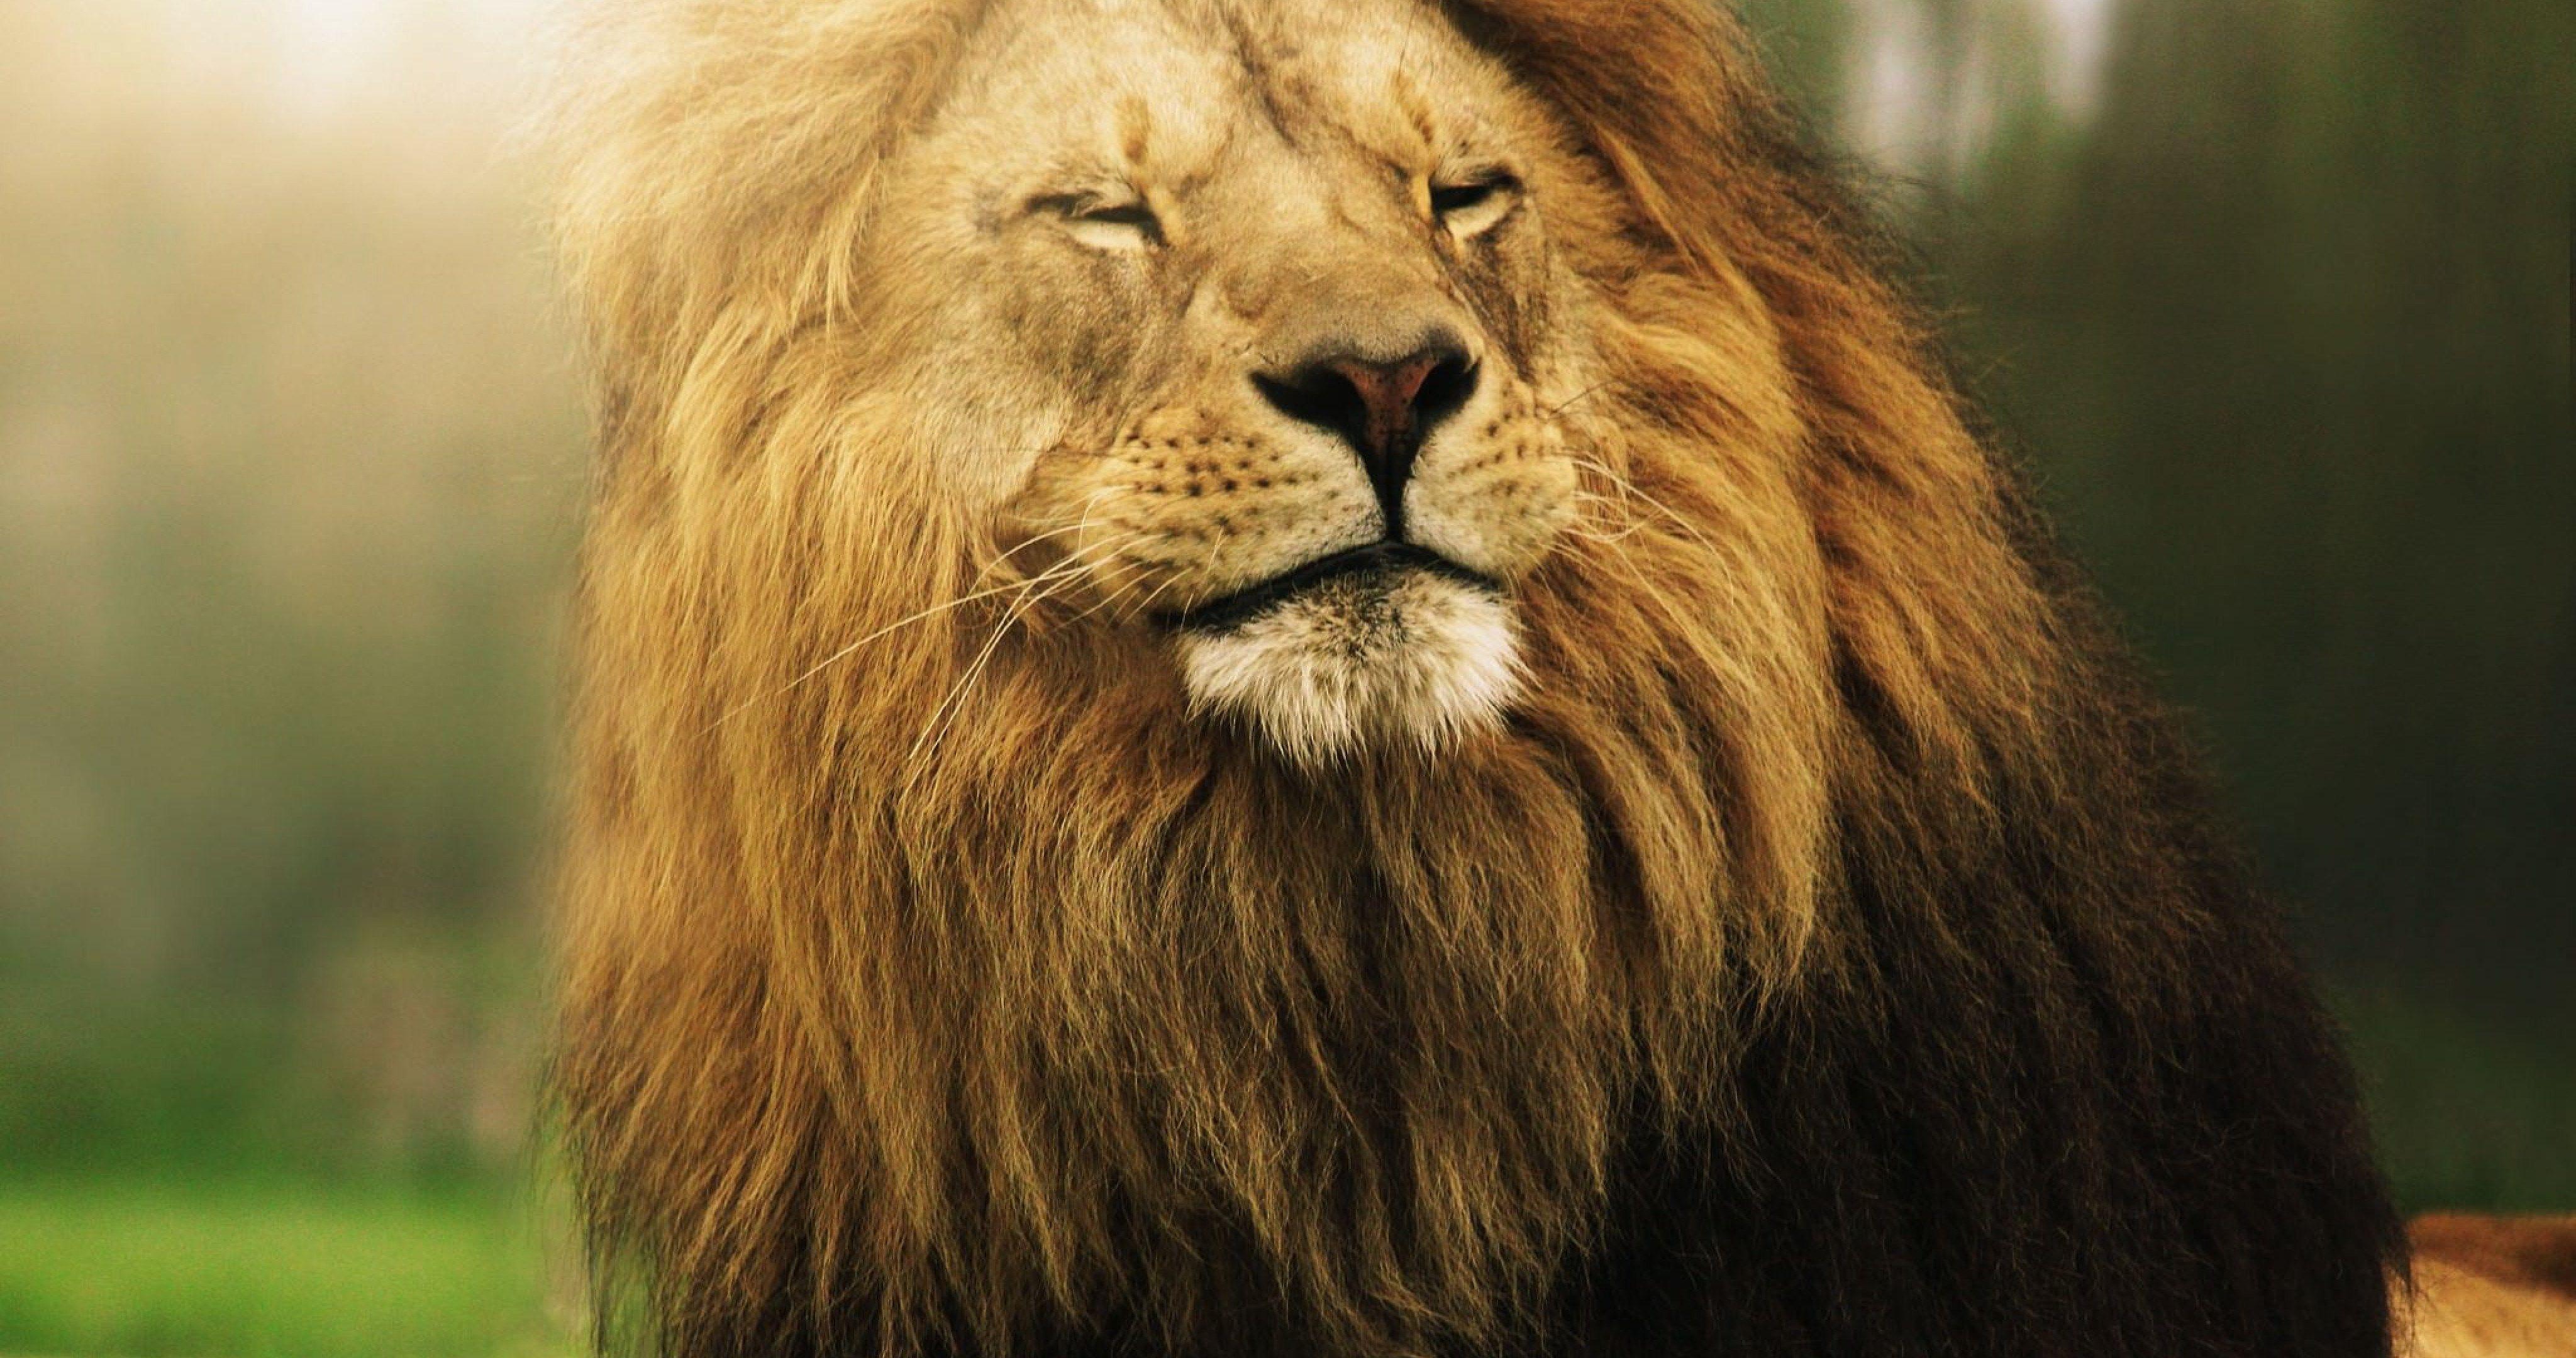 4k Ultra Hd Lions Wallpapers Top Free 4k Ultra Hd Lions Backgrounds Wallpaperaccess